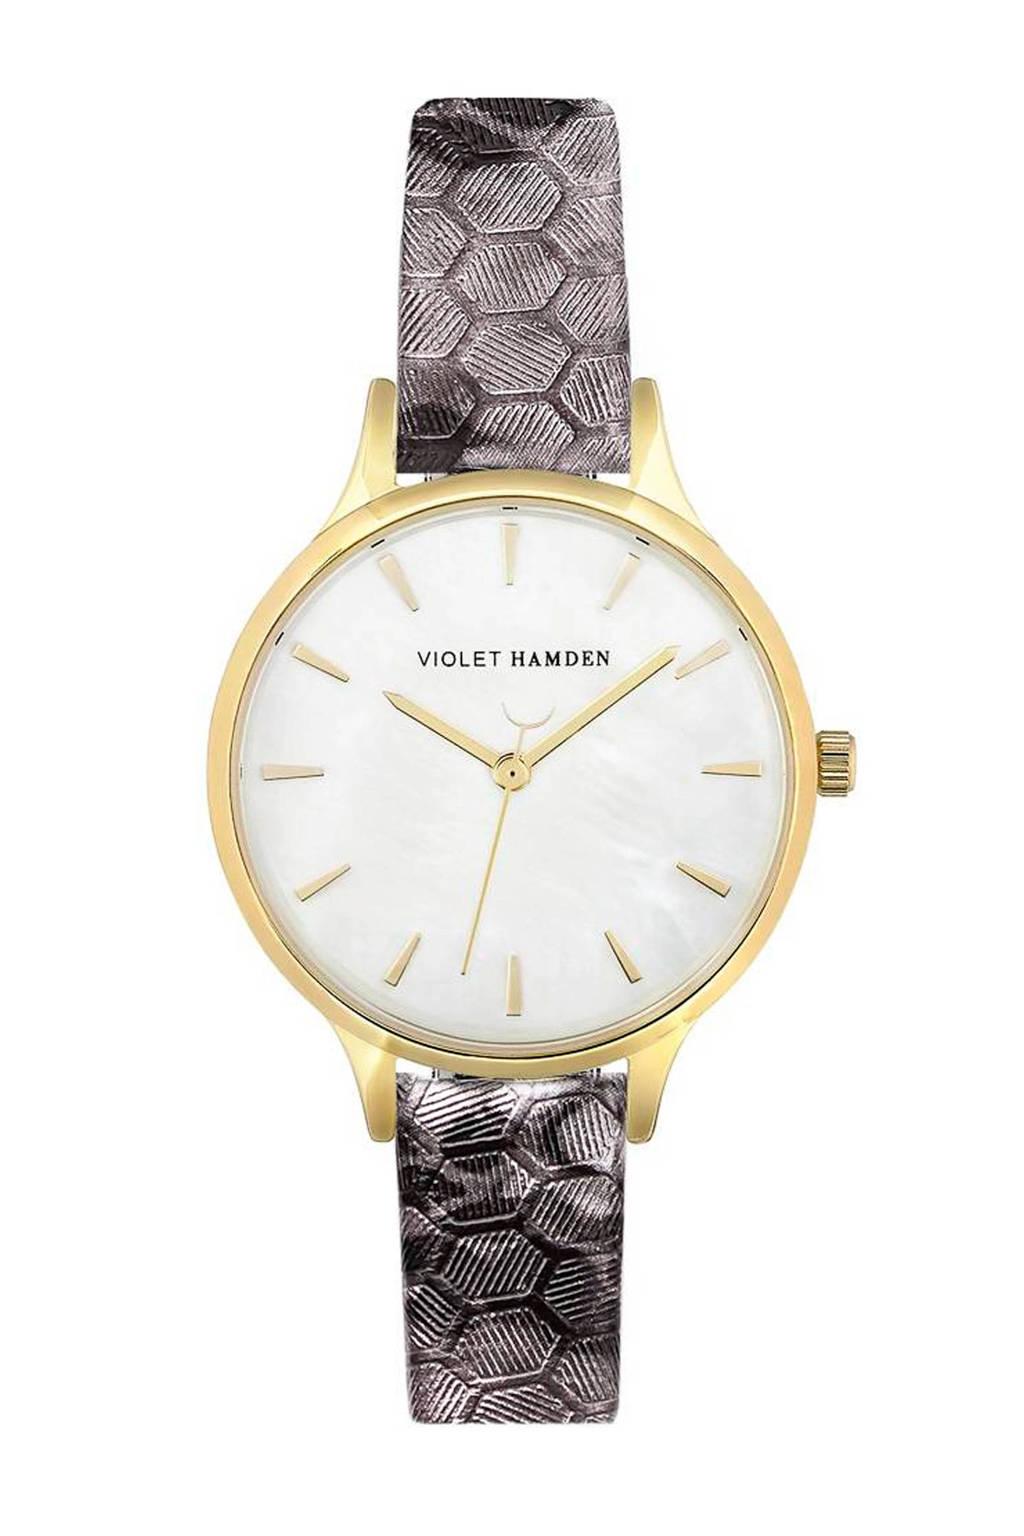 Violet Hamden horloge Day & Night Aurora VH01034, Zilverkleurig/zwart